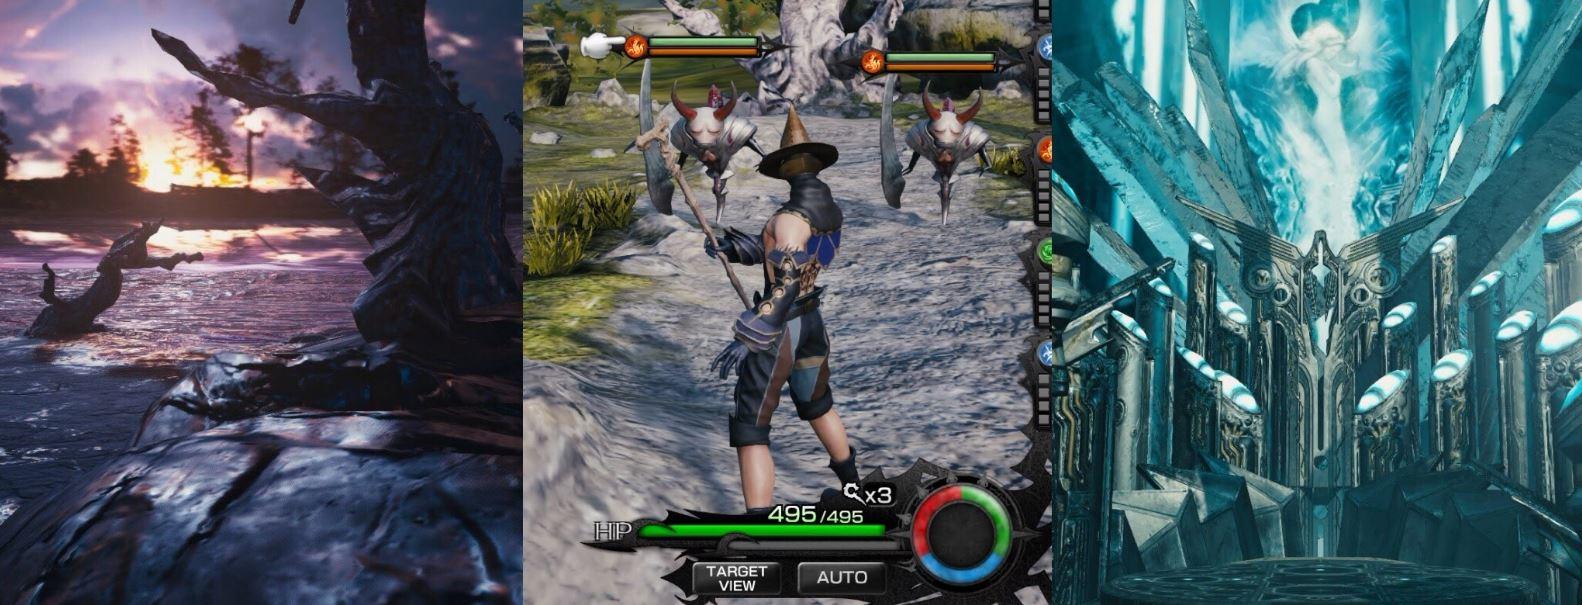 mobius ff multiplayer guide